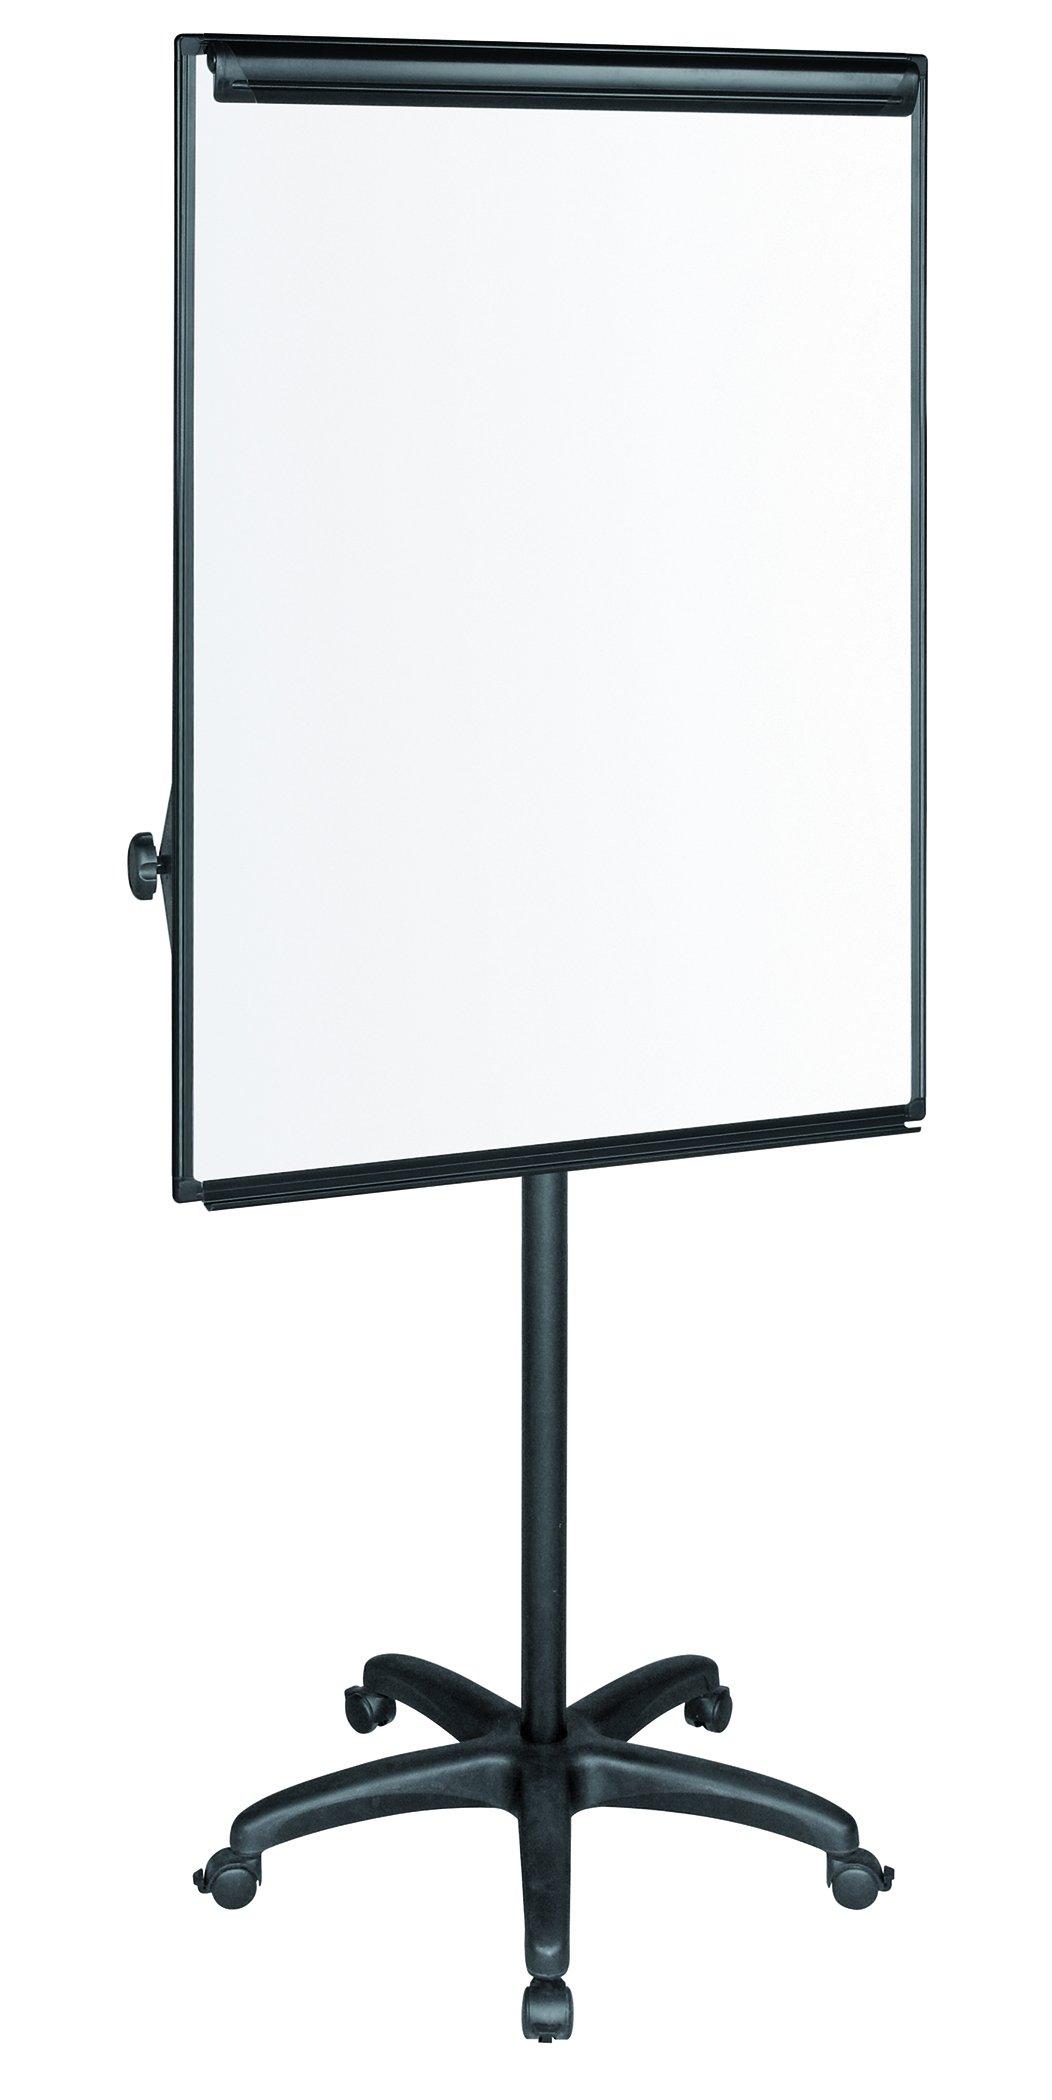 MasterVision Mobile Easel, 27.5'' x 39'' Dry Erase Board, Presentation Easel with Black Frame and Base